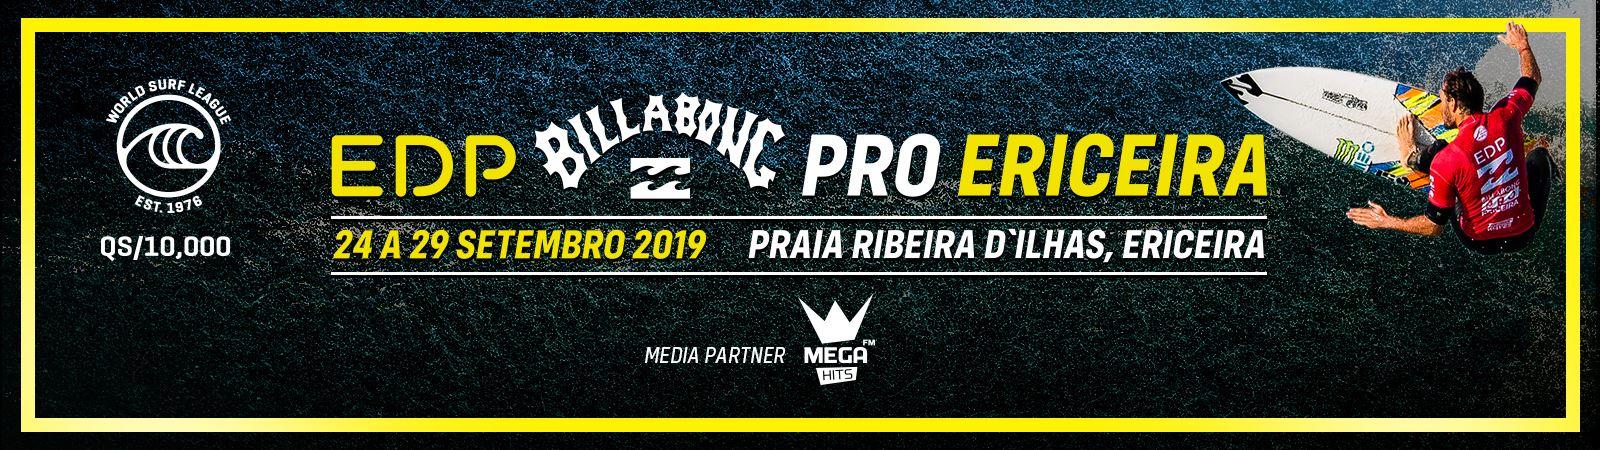 EDP Billabong Pro Ericeira